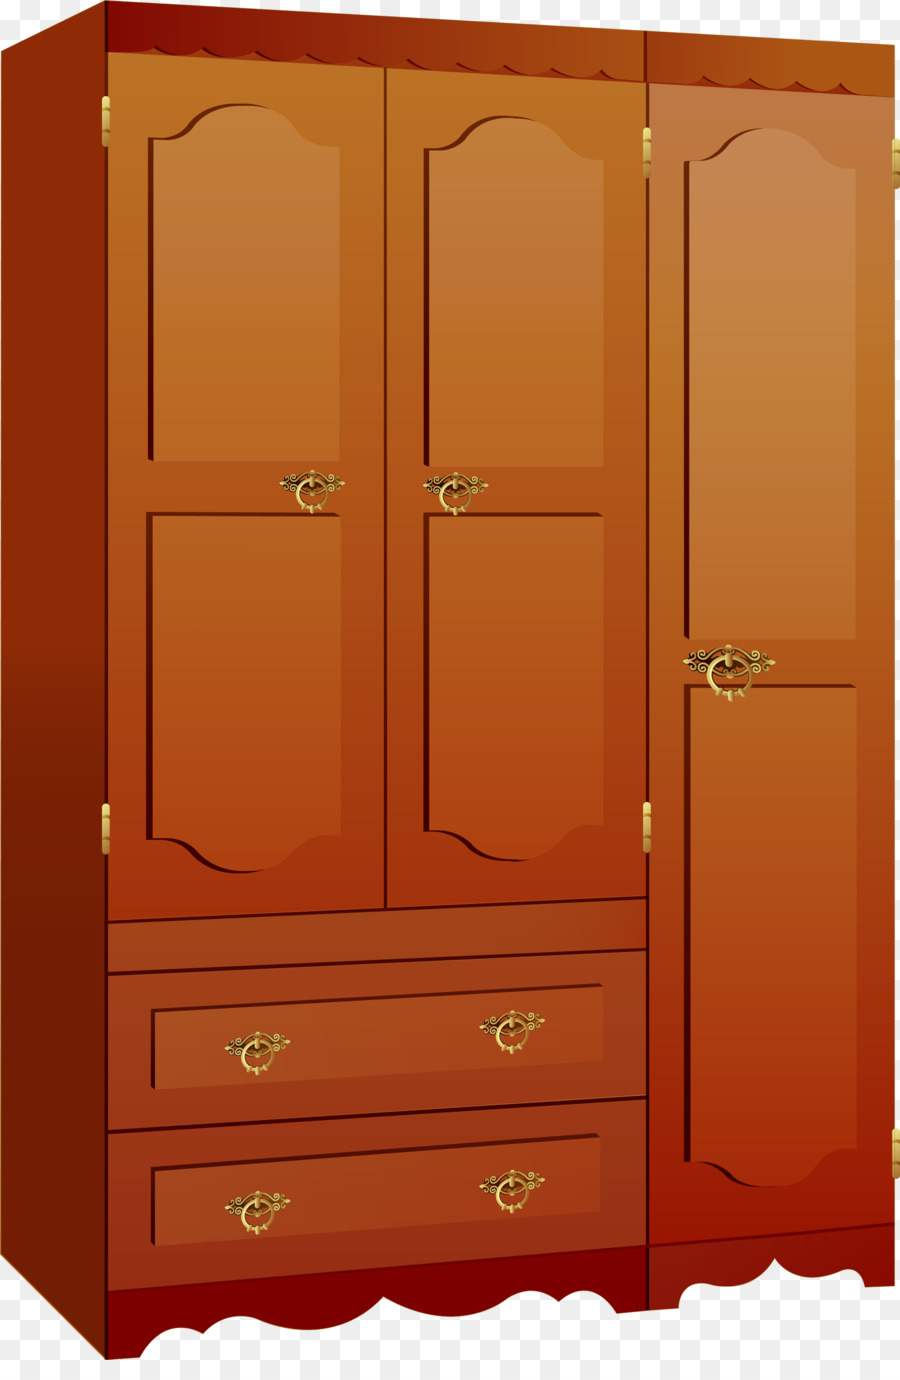 Armoires U0026 Wardrobes Furniture Cabinetry Cupboard Clip Art   Cupboard